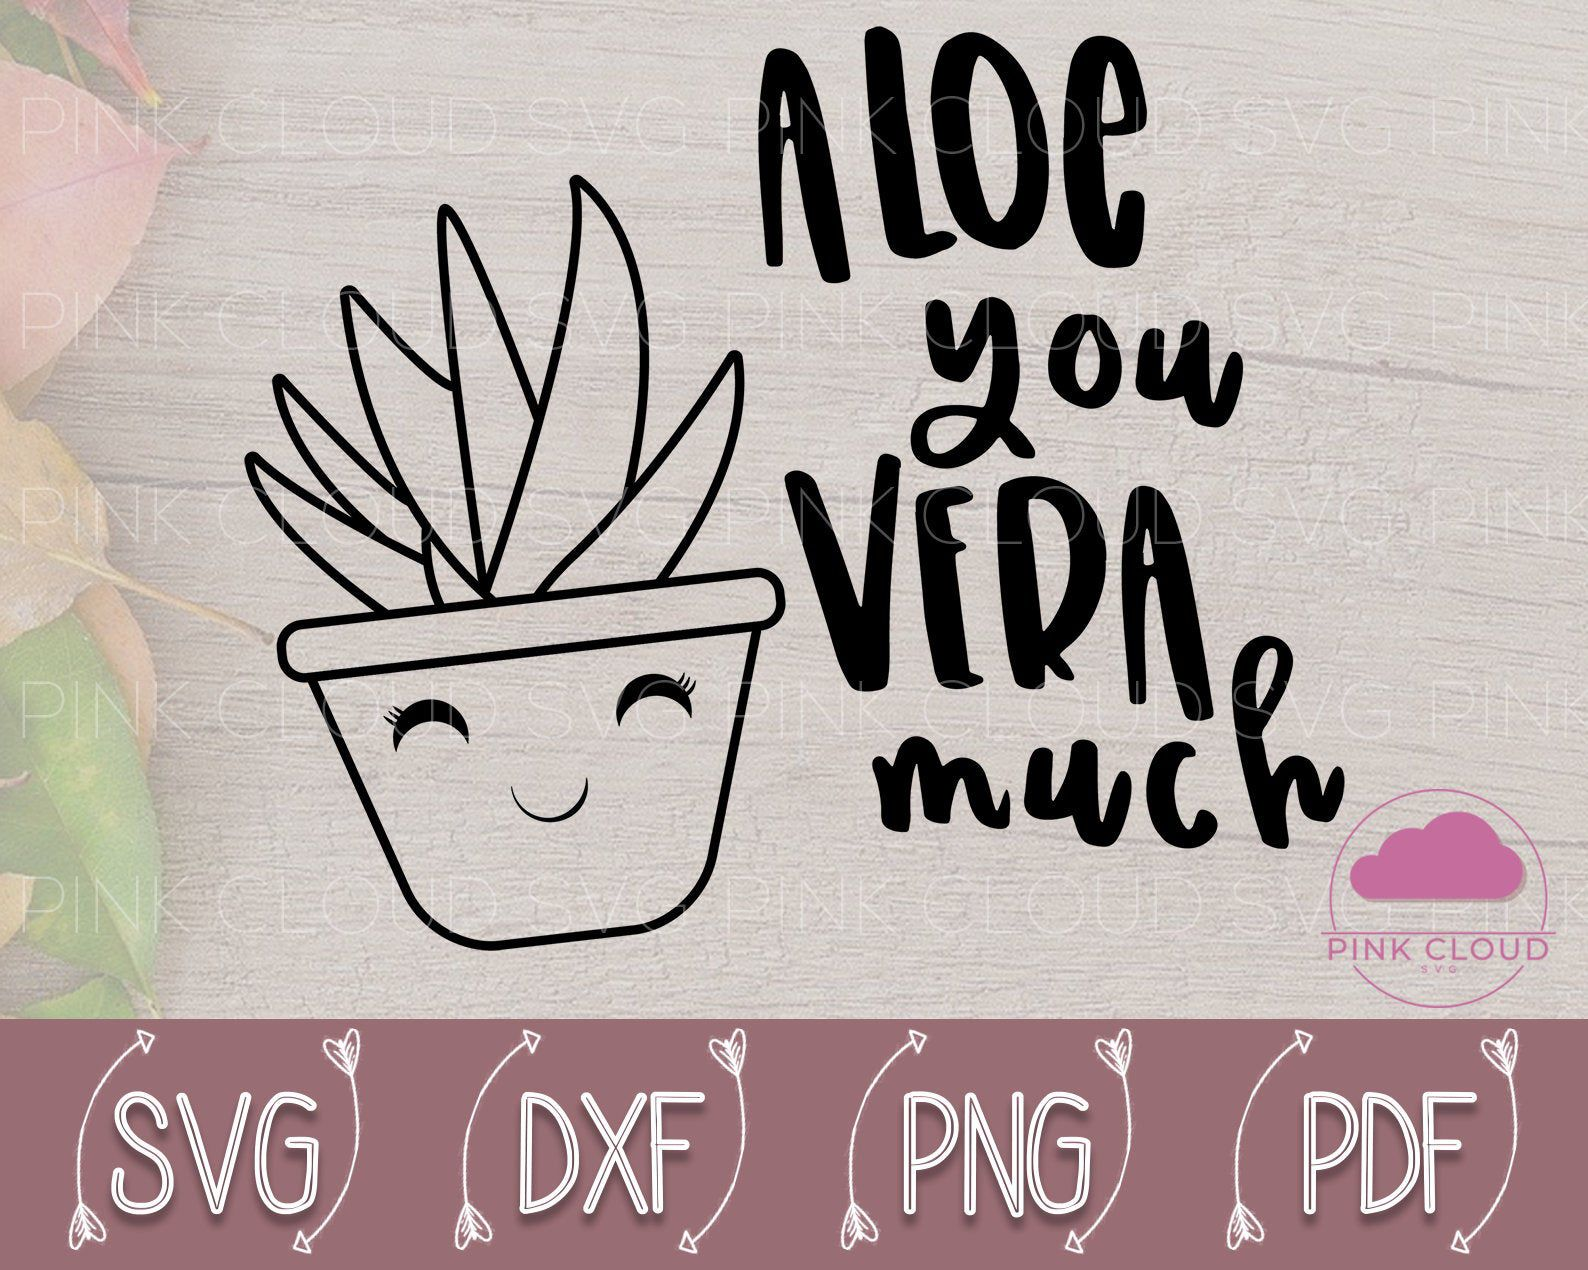 Download Aloe You Vera Much Svg, Aloe You Vera Much Shirt ...